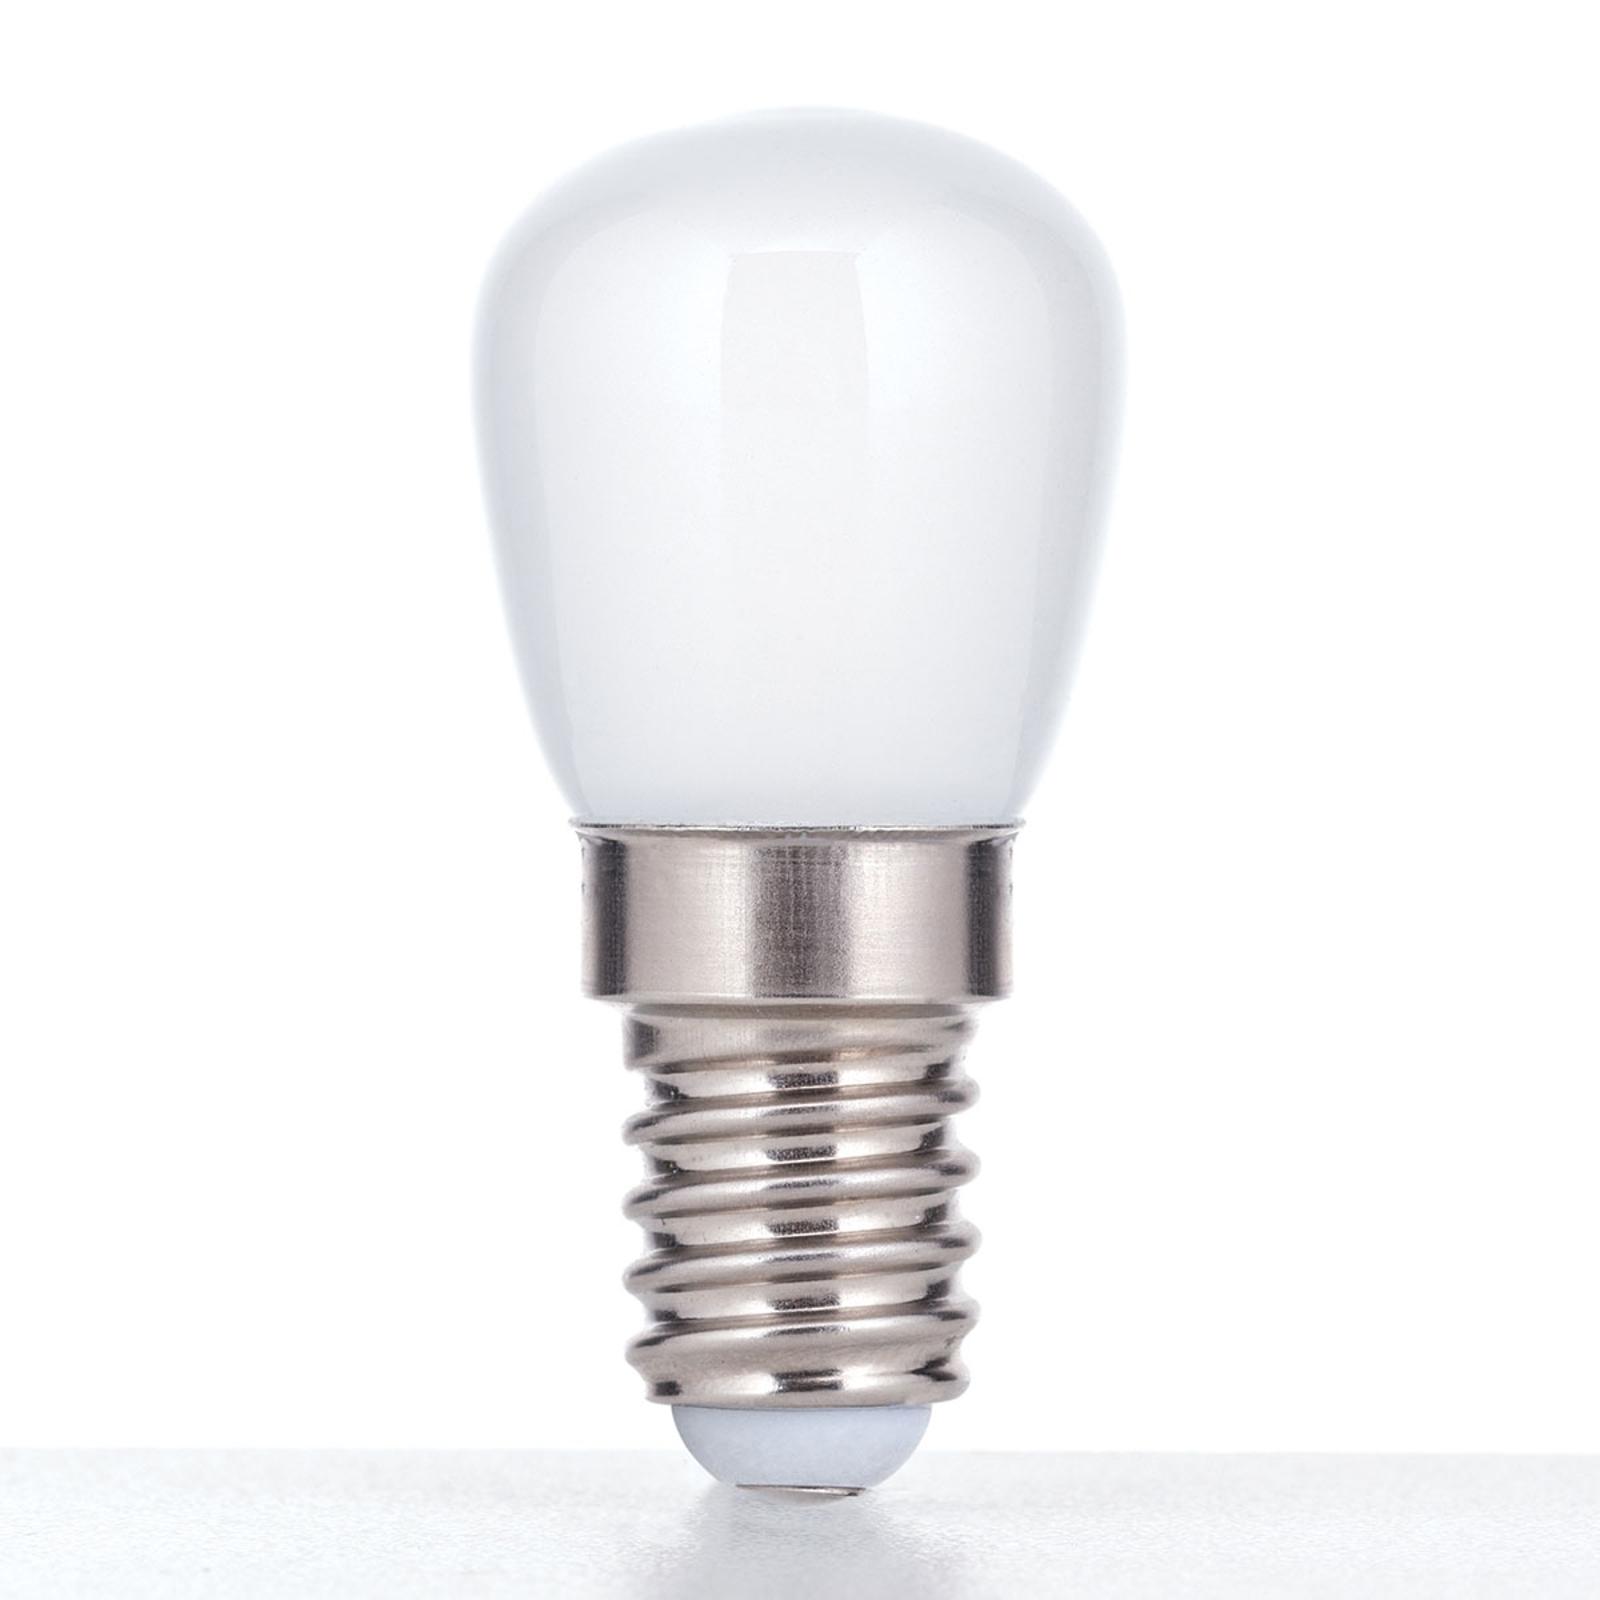 LED da frigorifero E14 1,2W, opale, bianco caldo